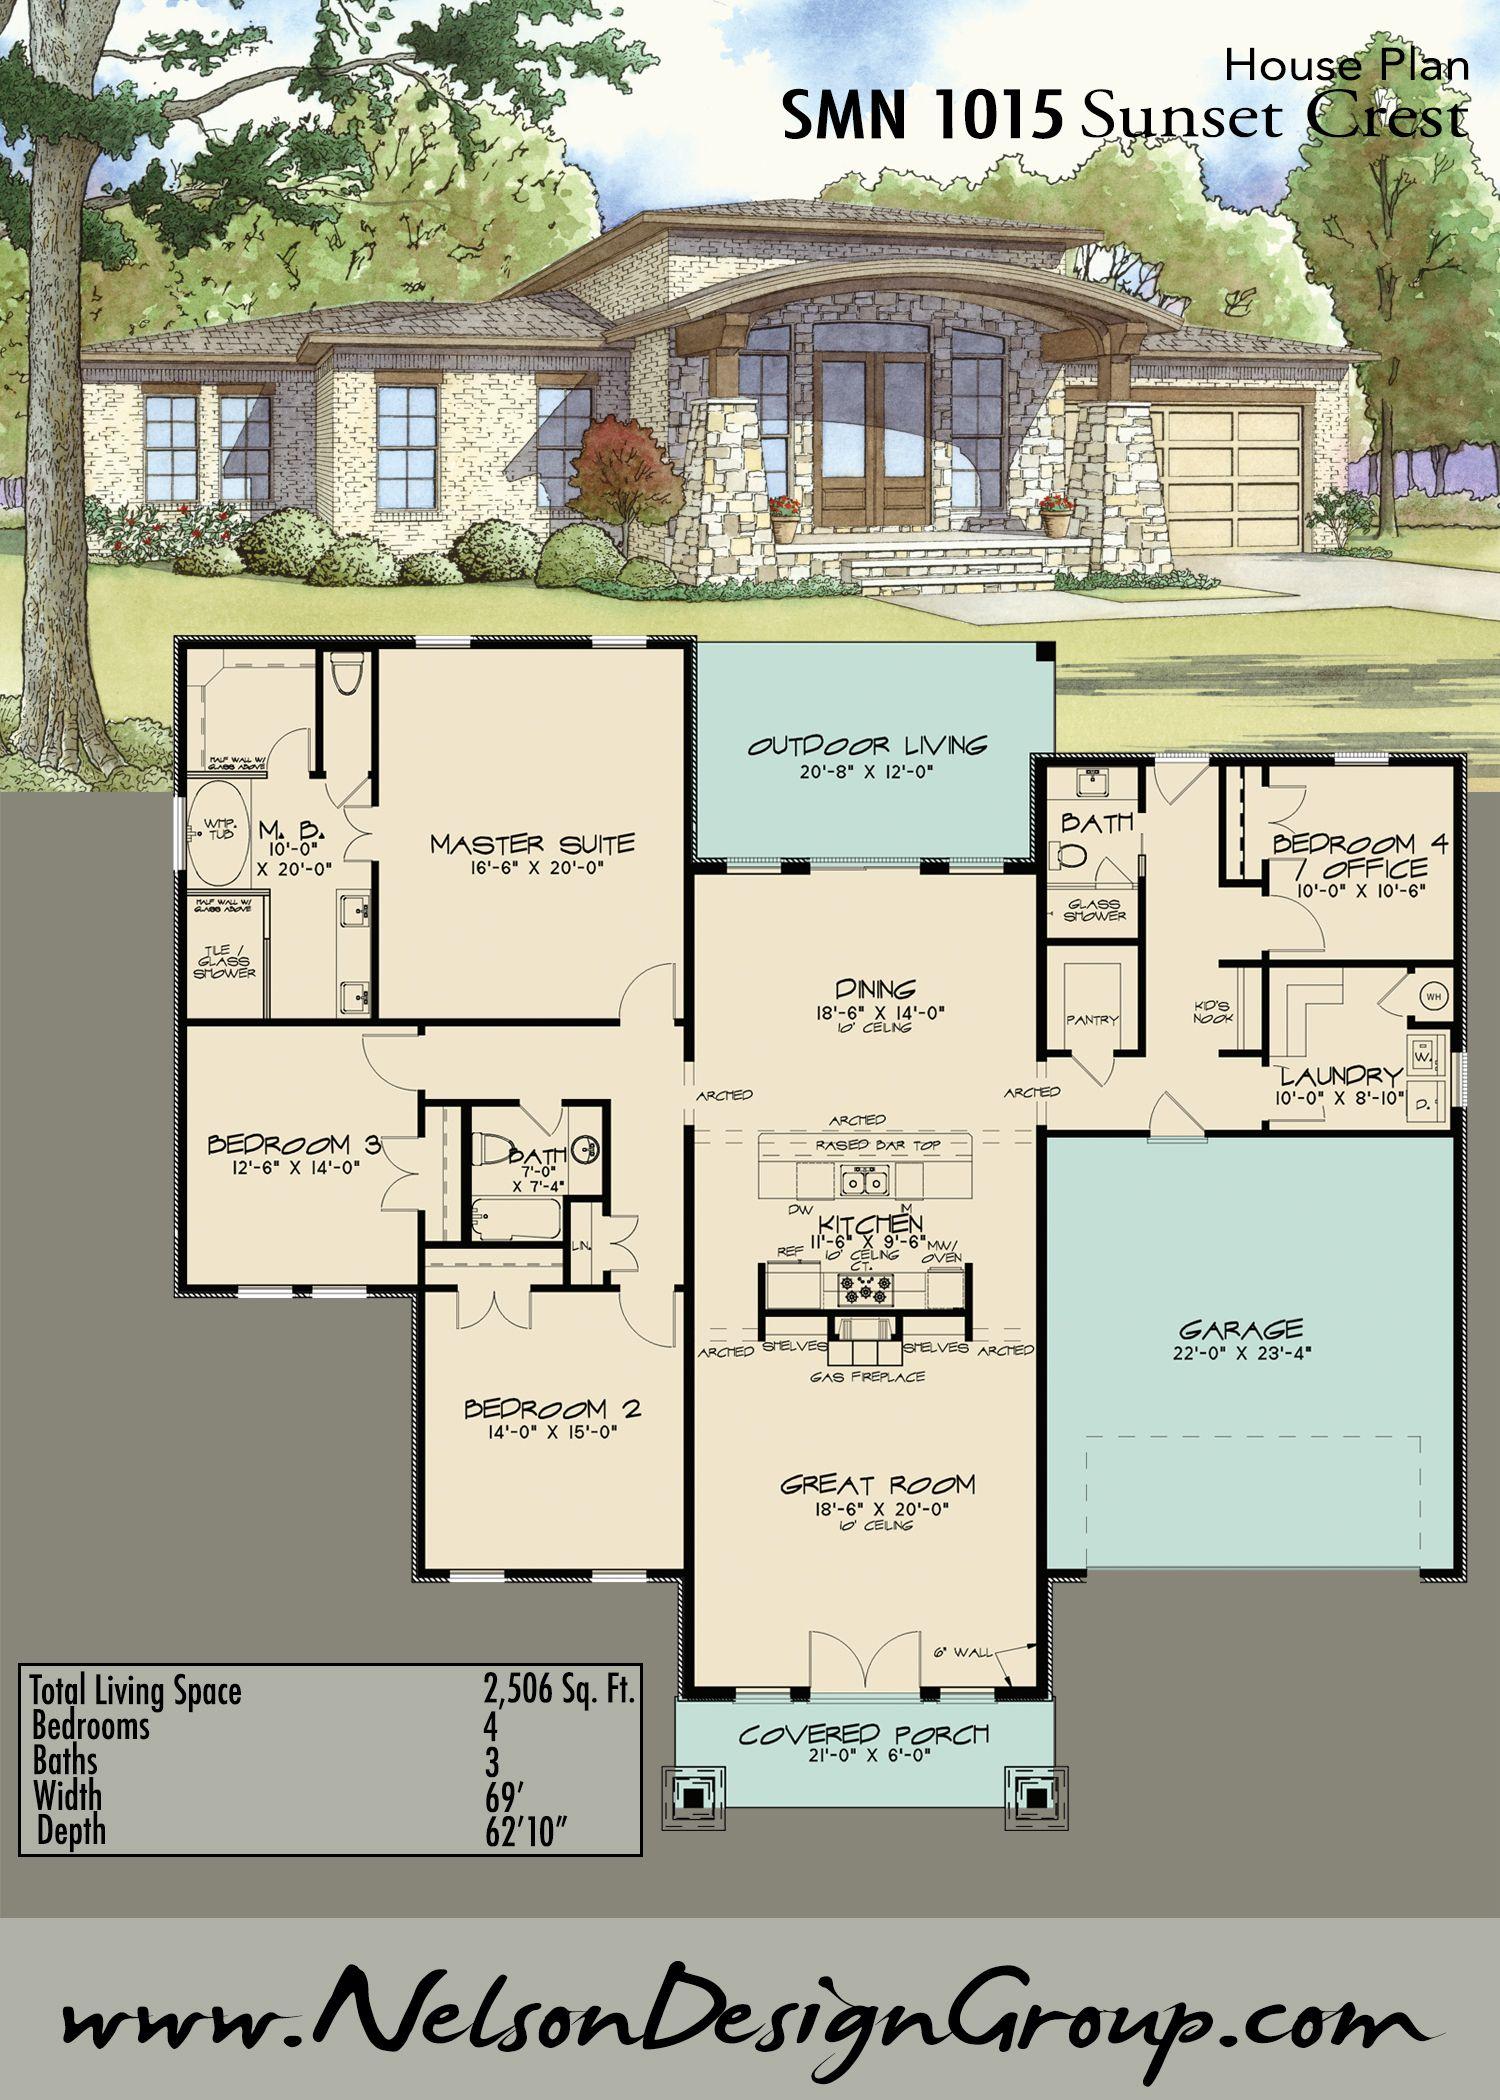 Modern Moderndesign Houseplan Homeplan Homedesign Grandentrance Brick Stone Columns Garage House Plans Modern House Plan House Design